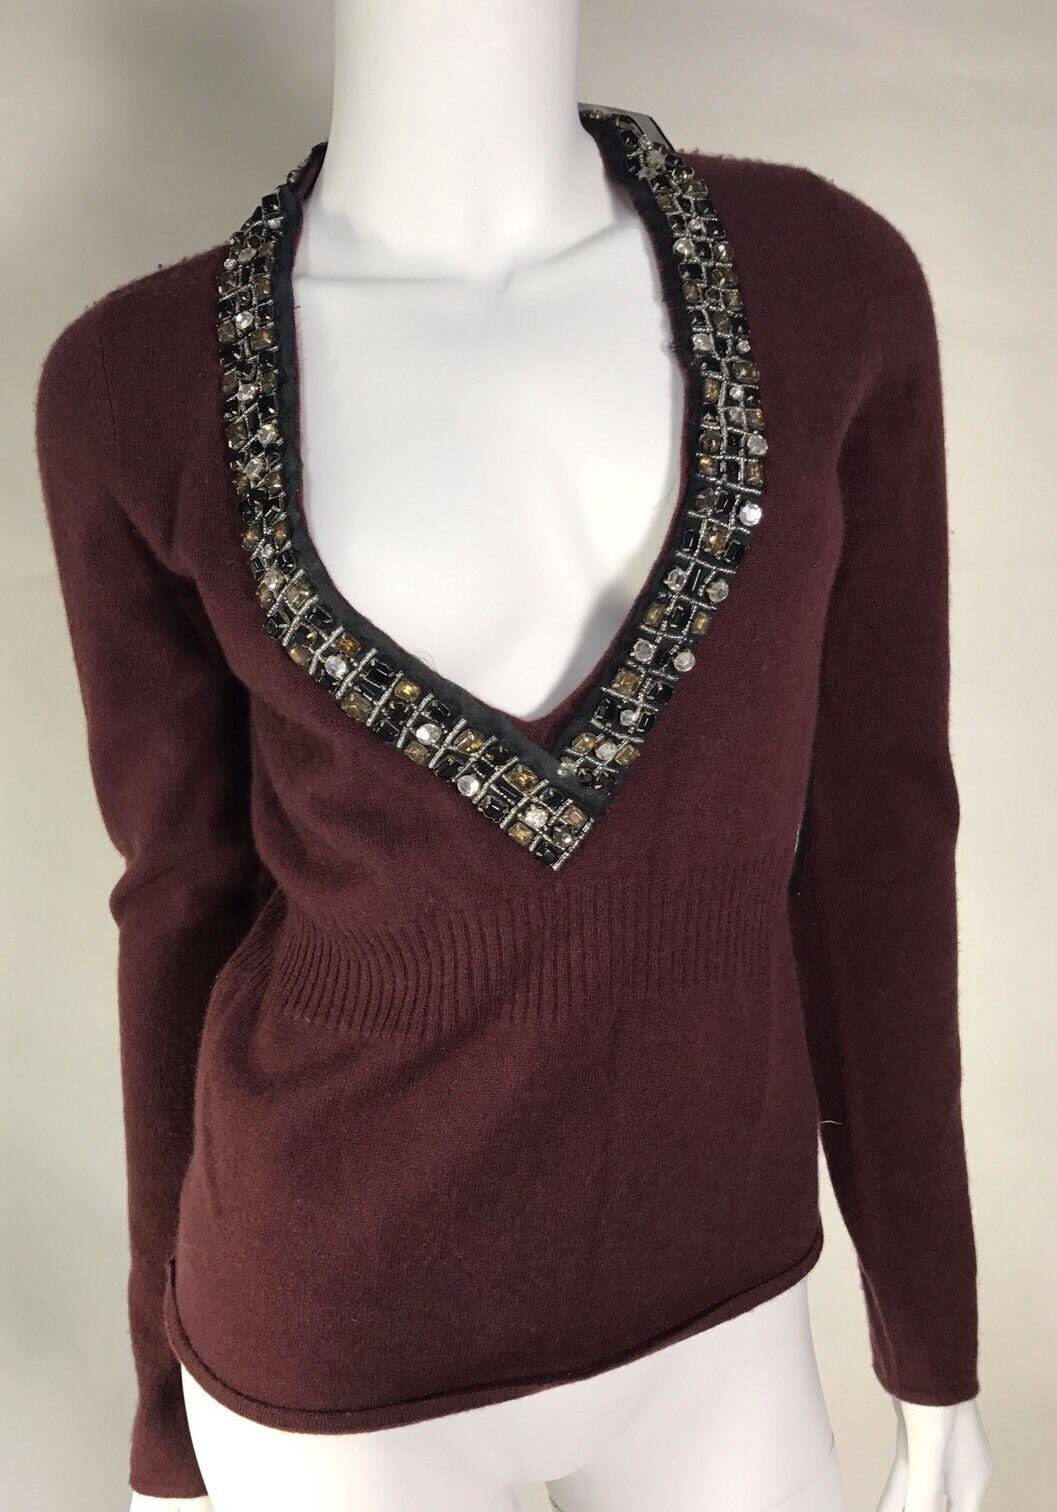 Nwt Christopher Pischer 100% Cashmere Sweater SZ M Retail495  WithCristal Decor